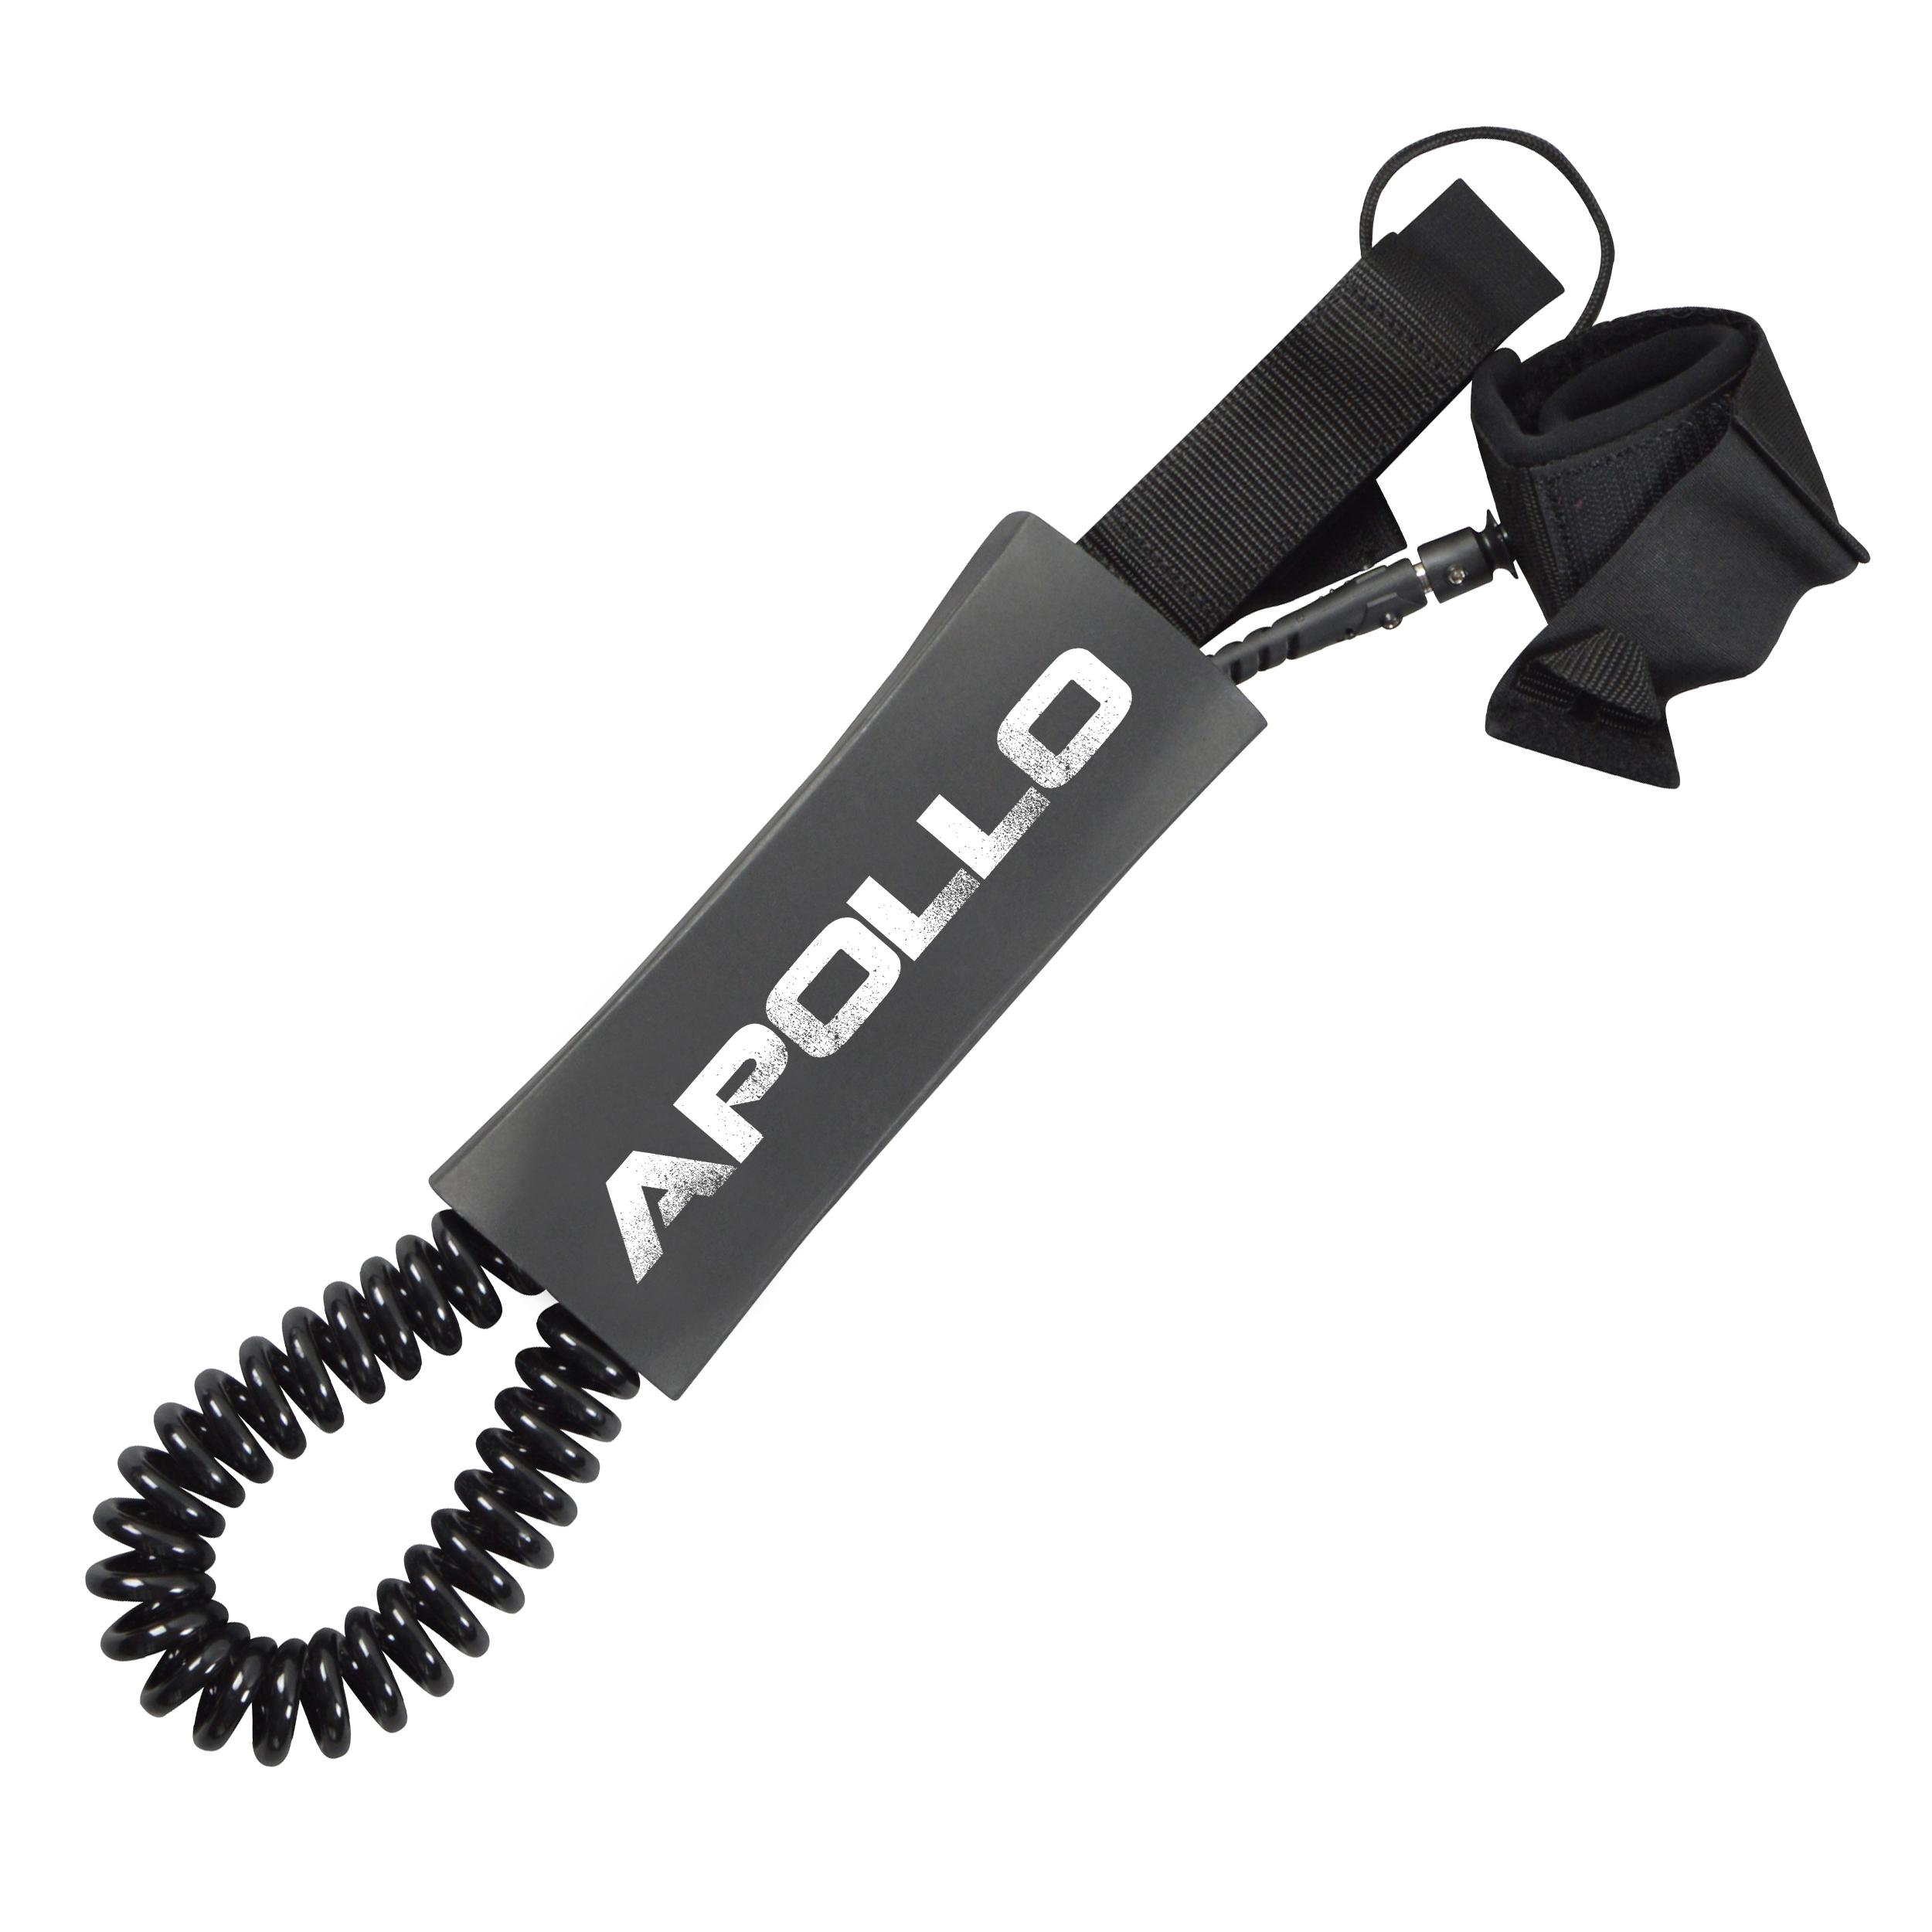 Apollo SUP Leash, Coiled Leash fürs Paddelboard, SUP-Leine